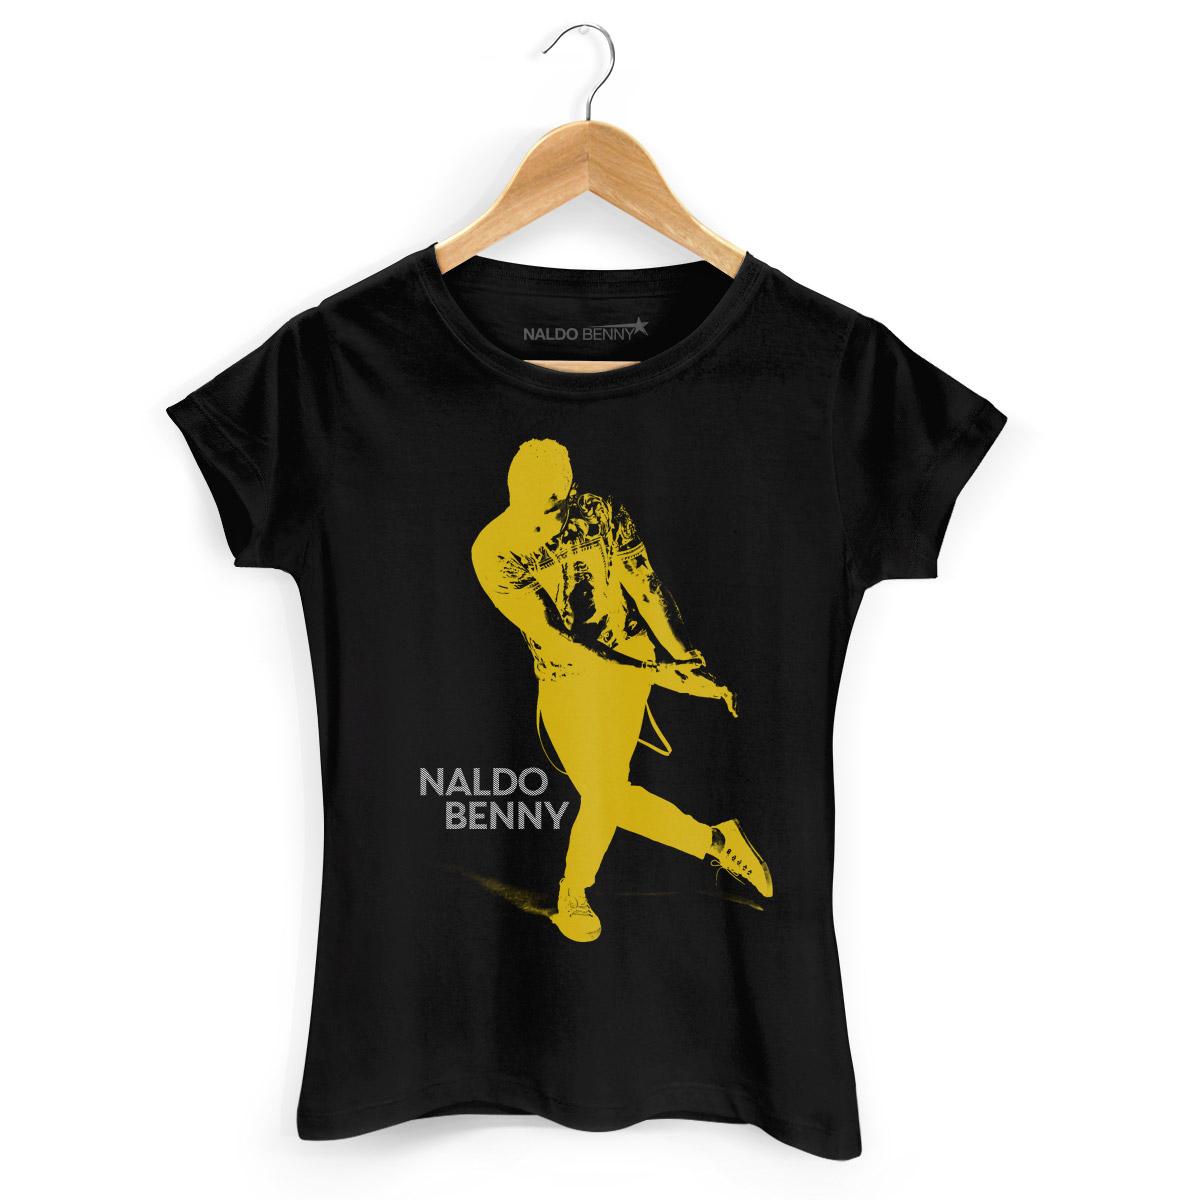 Camiseta Feminina Naldo Benny Se Joga Yellow